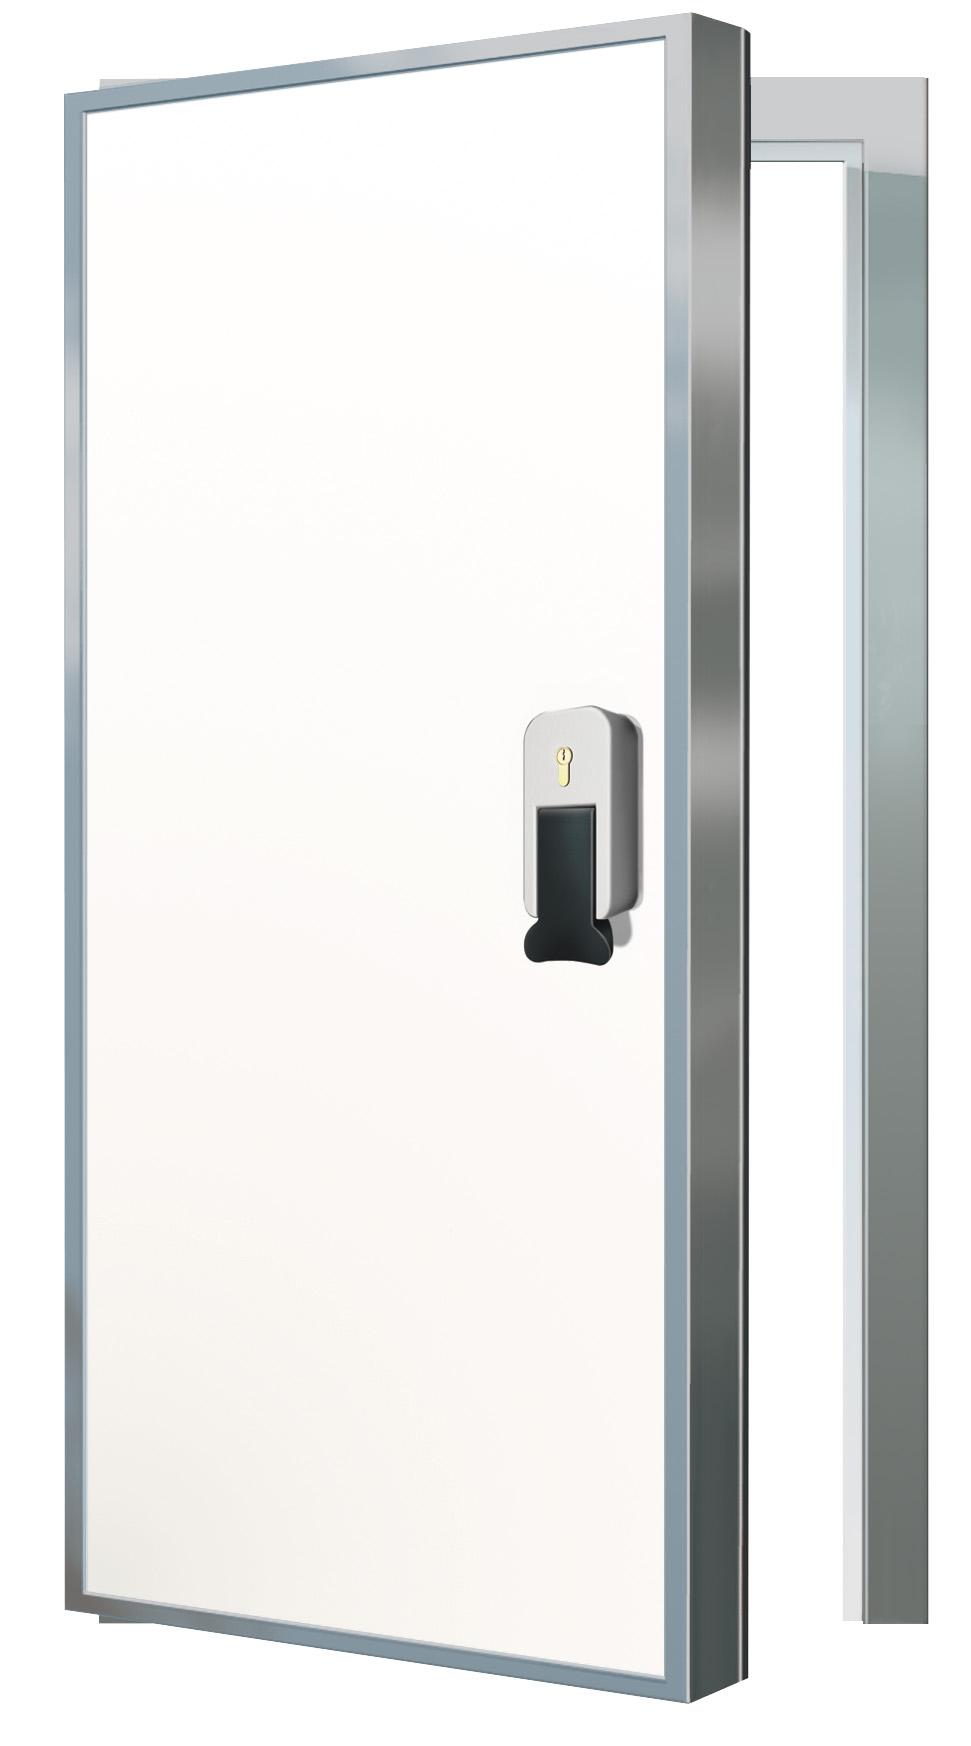 Panneaux isothermes - Chambres froides - IF39Isolation Frigorifique 39